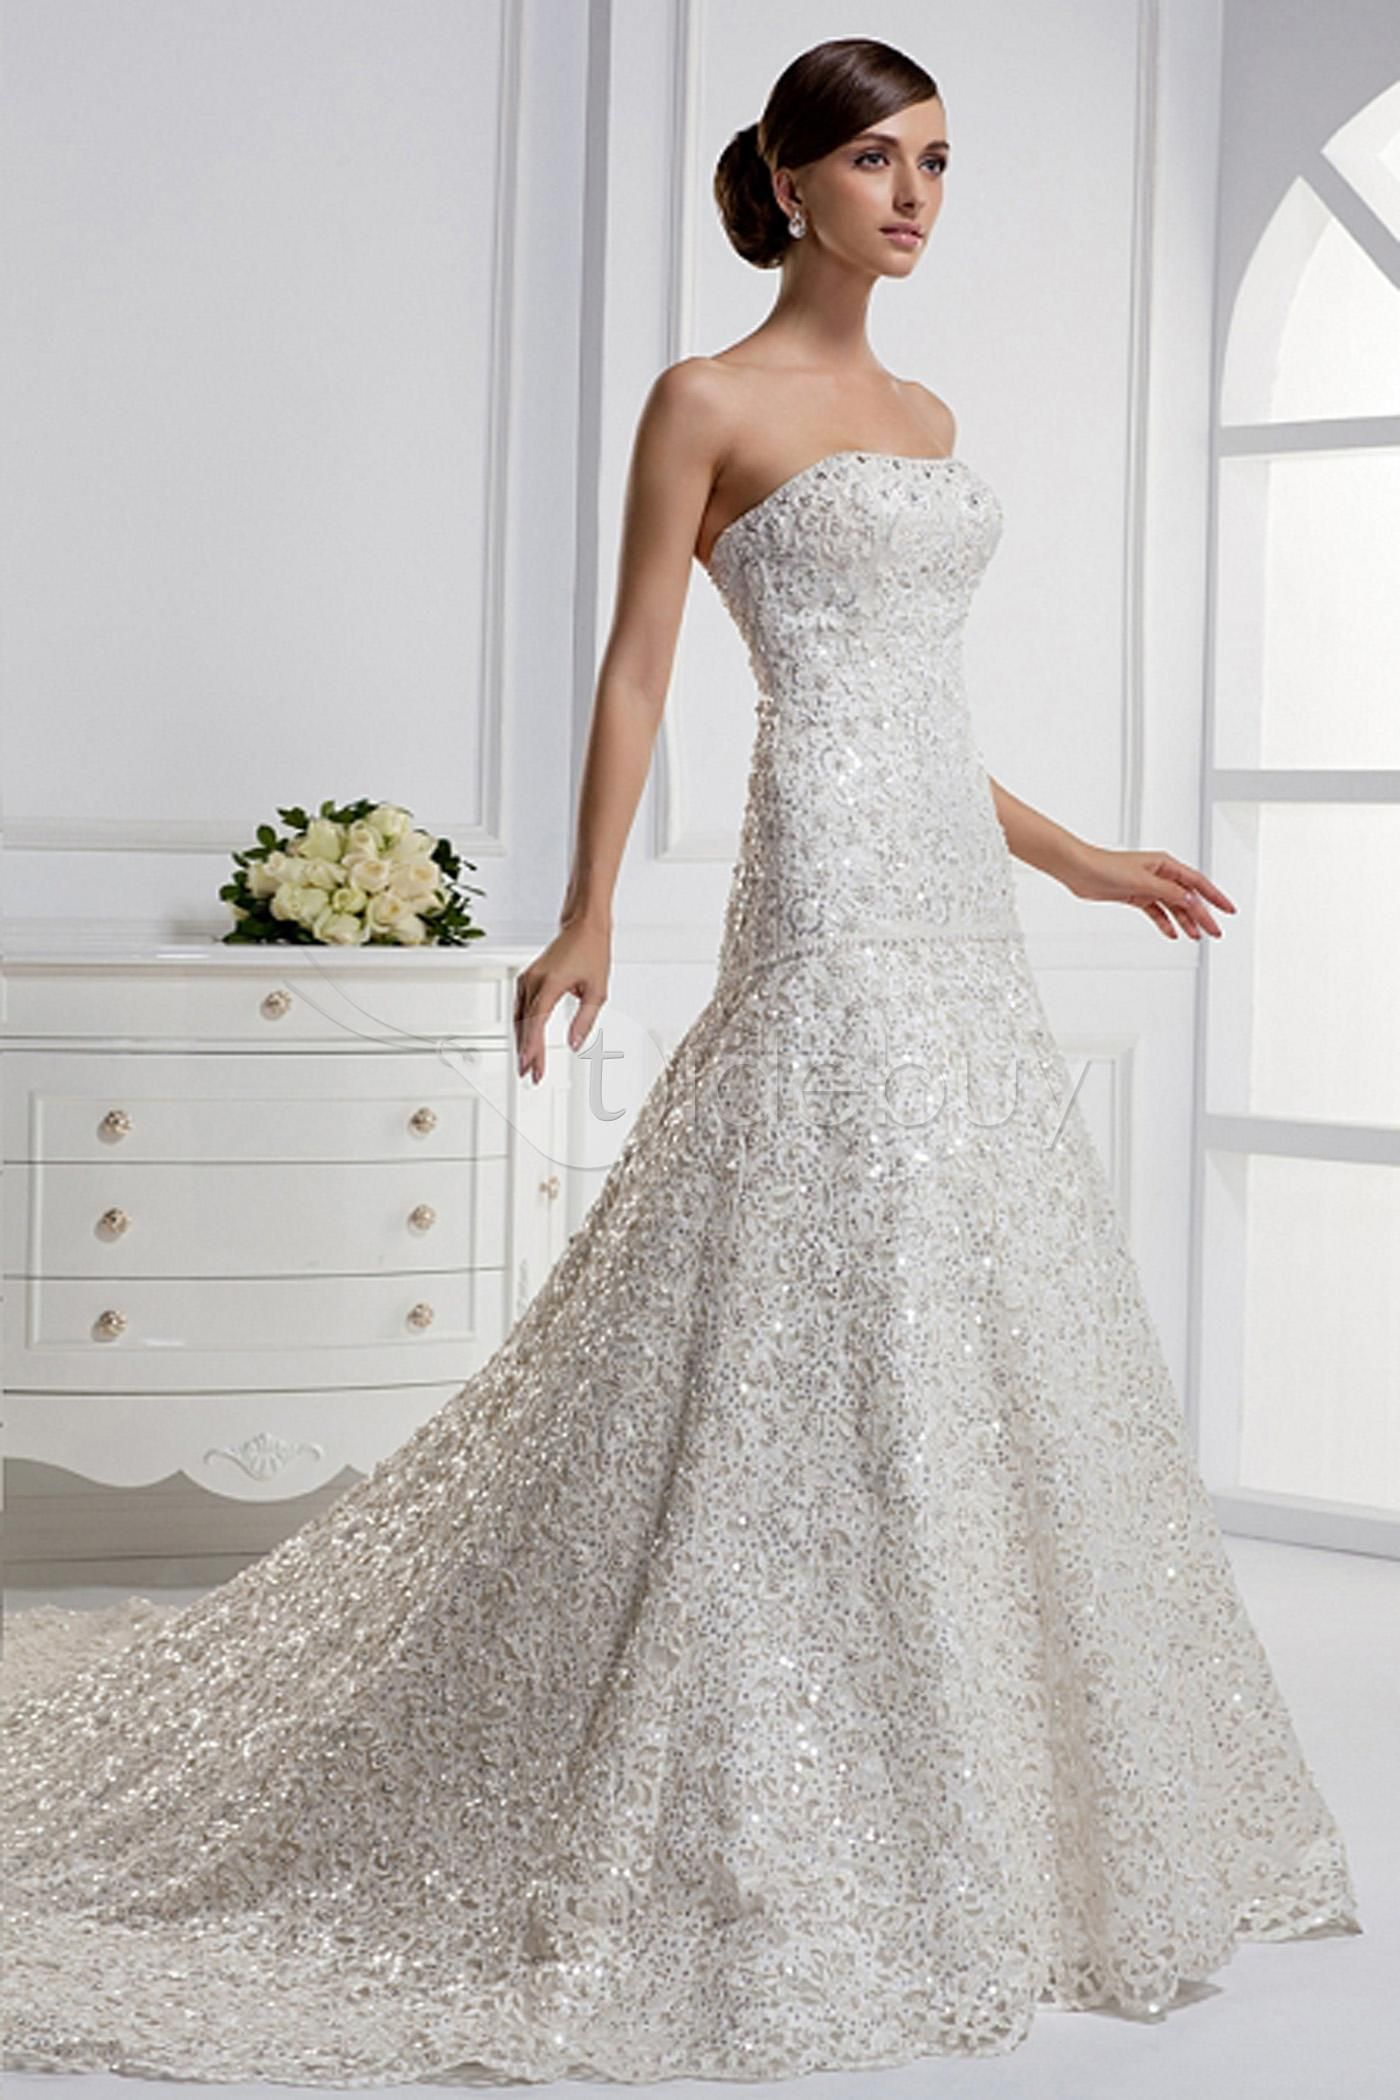 wedding ideas wedding dress com 17 parasta kuvaa Wedding ideas Pinterestiss Iltapuvut Handfasting ja Renesanssi